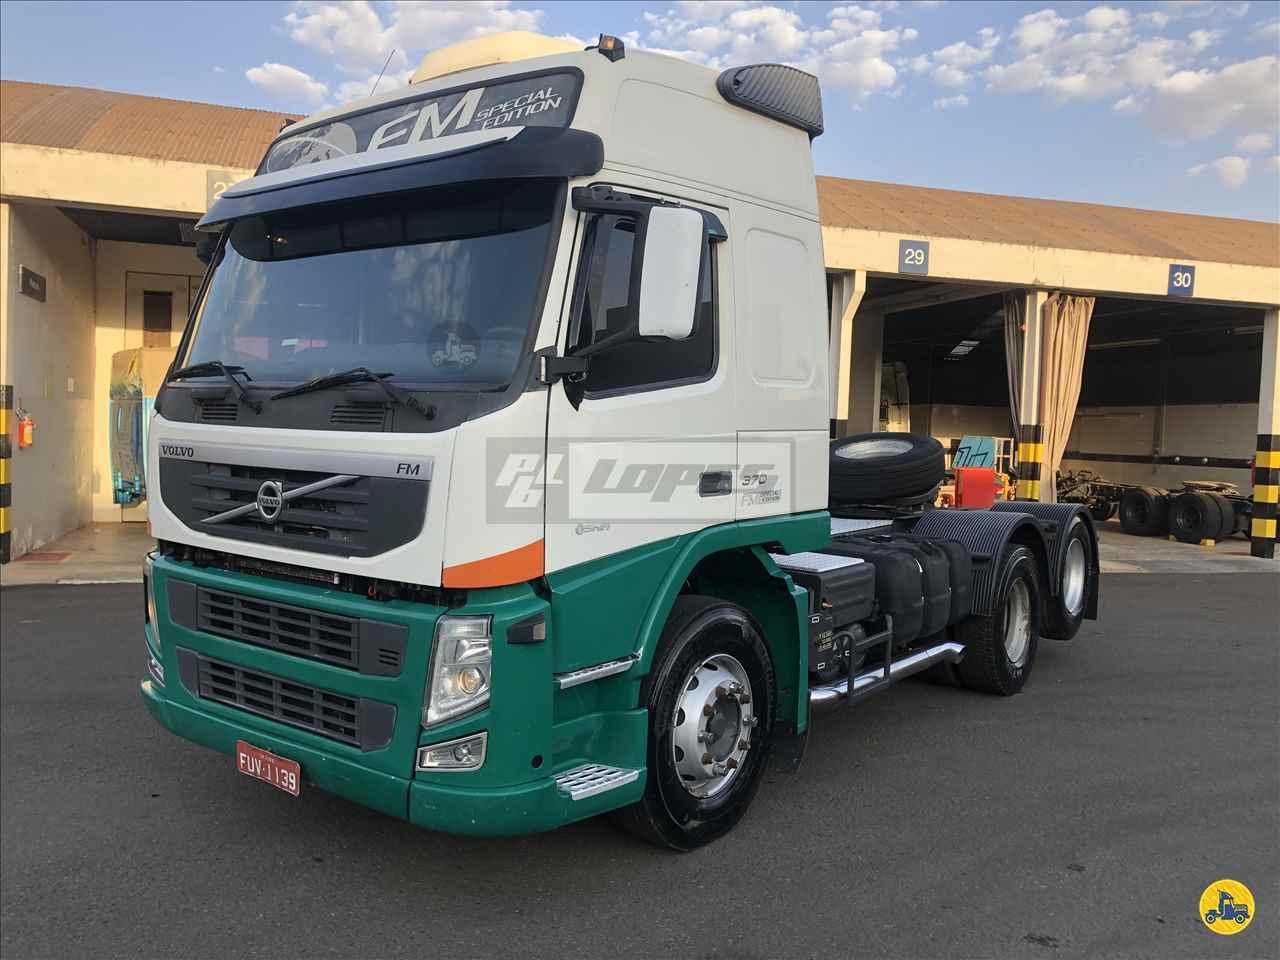 CAMINHAO VOLVO VOLVO FM 370 Cavalo Mecânico Truck 6x2 P.B. Lopes - Scania MARINGA PARANÁ PR